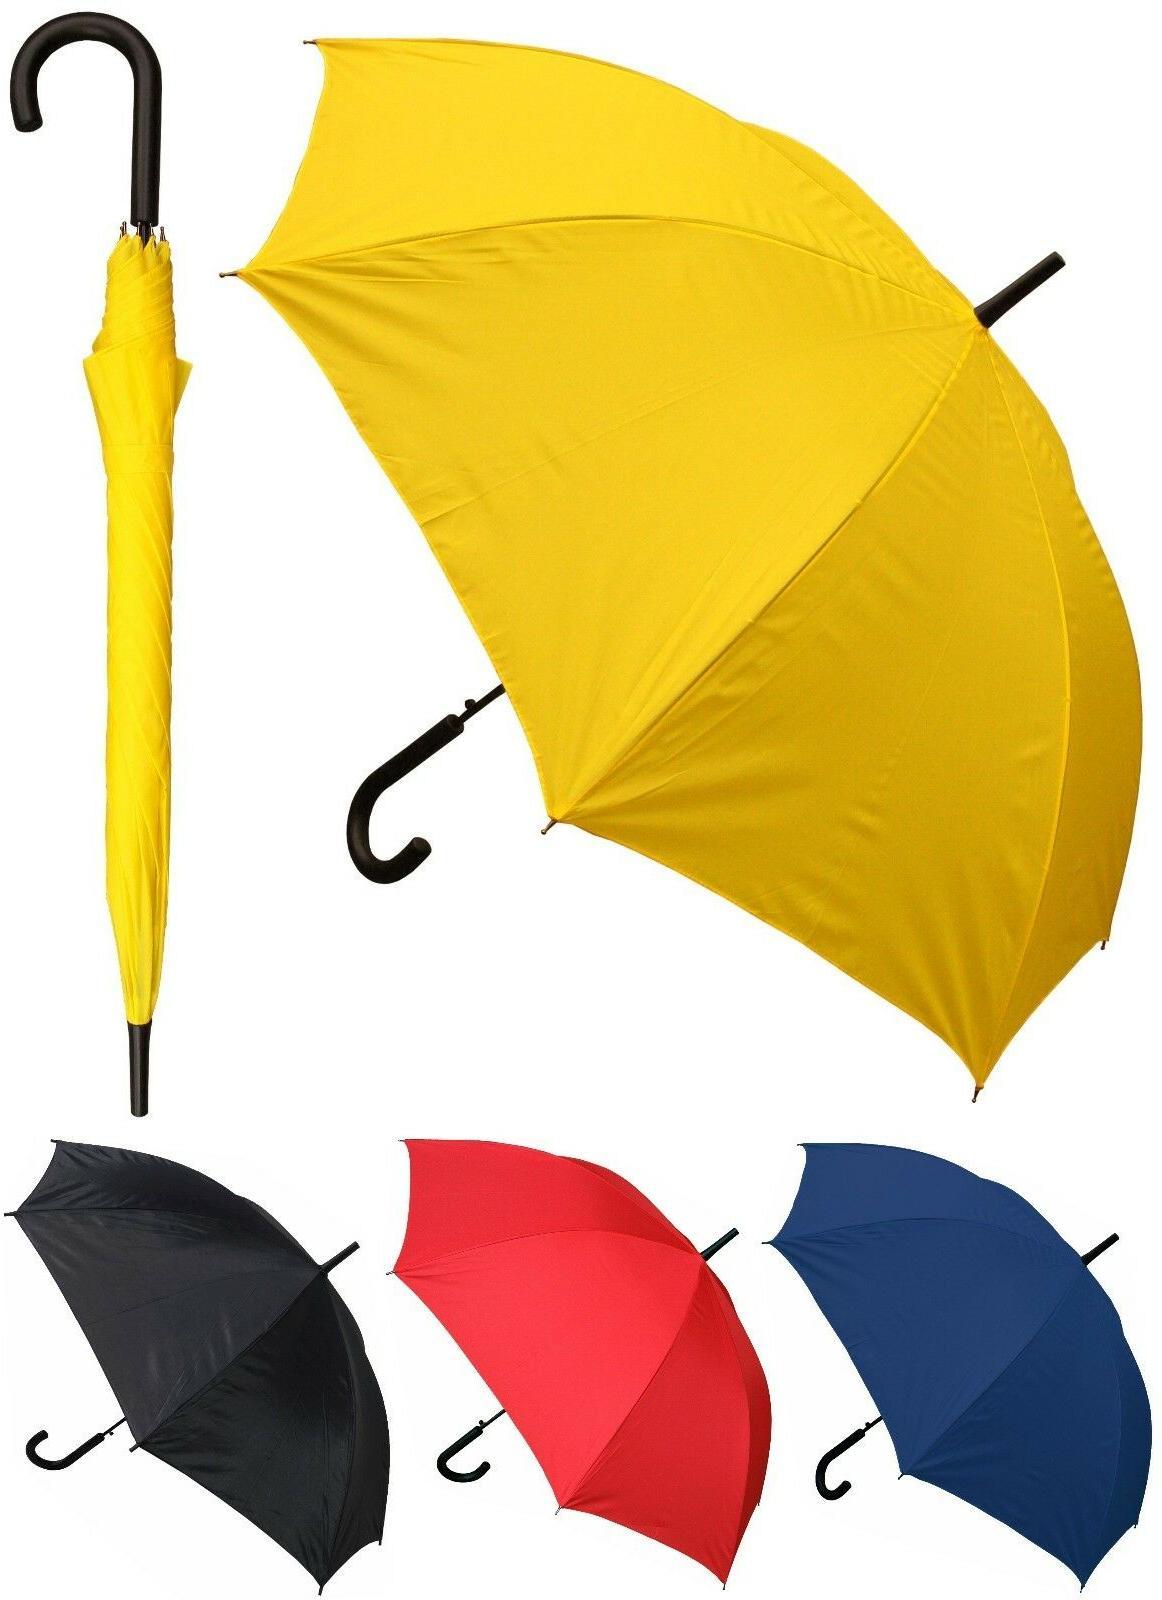 "Lot of 12 - 48"" Arc Doorman, Black Handle Umbrellas - RainSt"